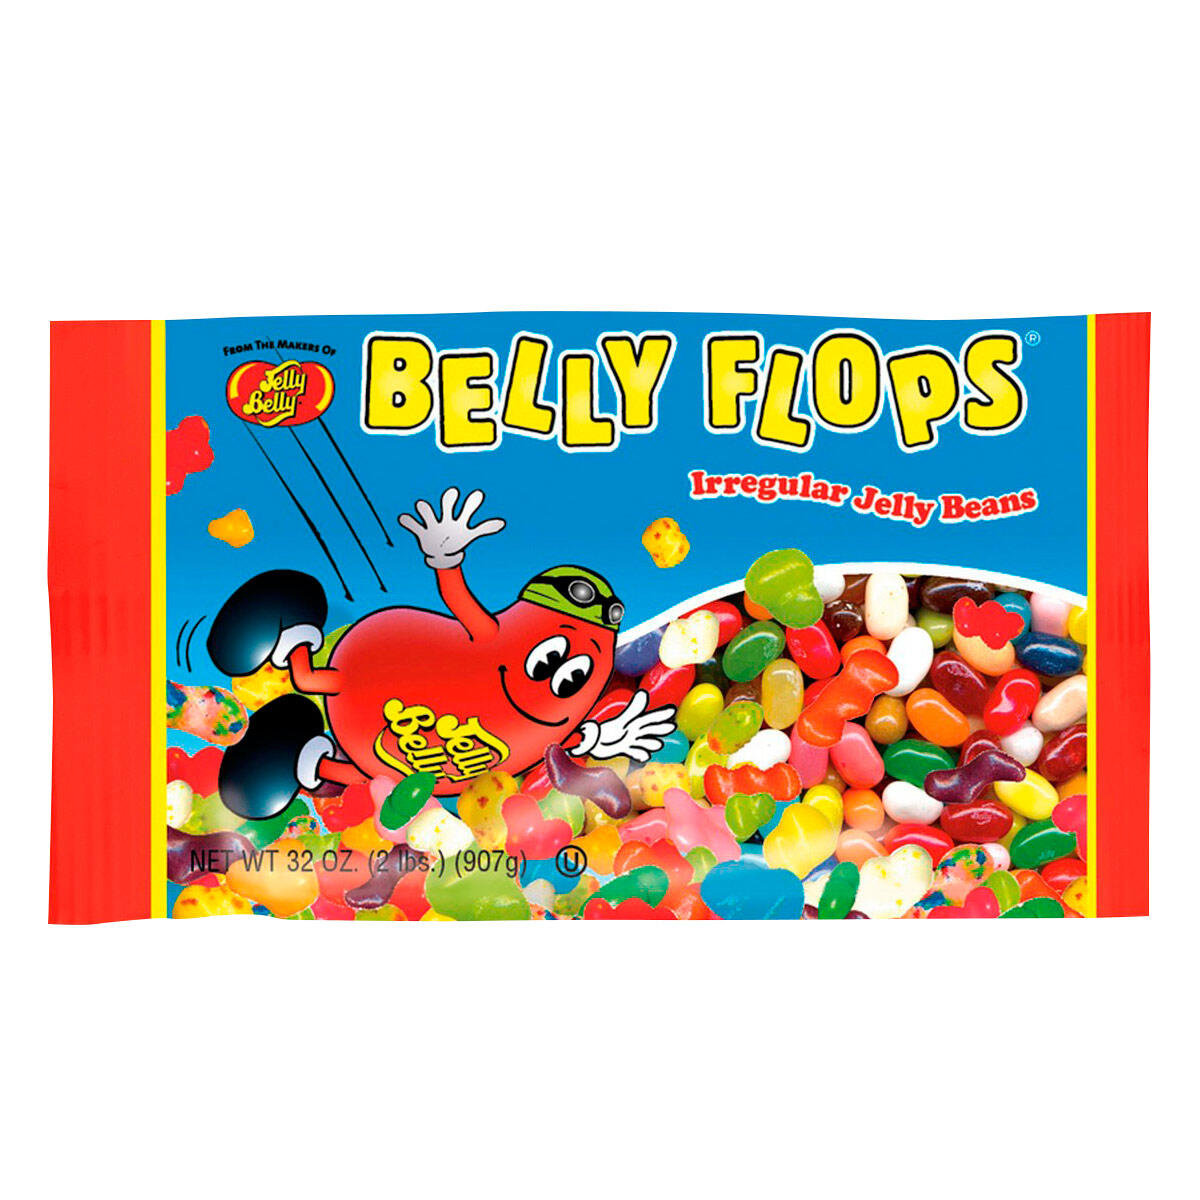 Belly Flops Jelly Beans 2 Lb Bag